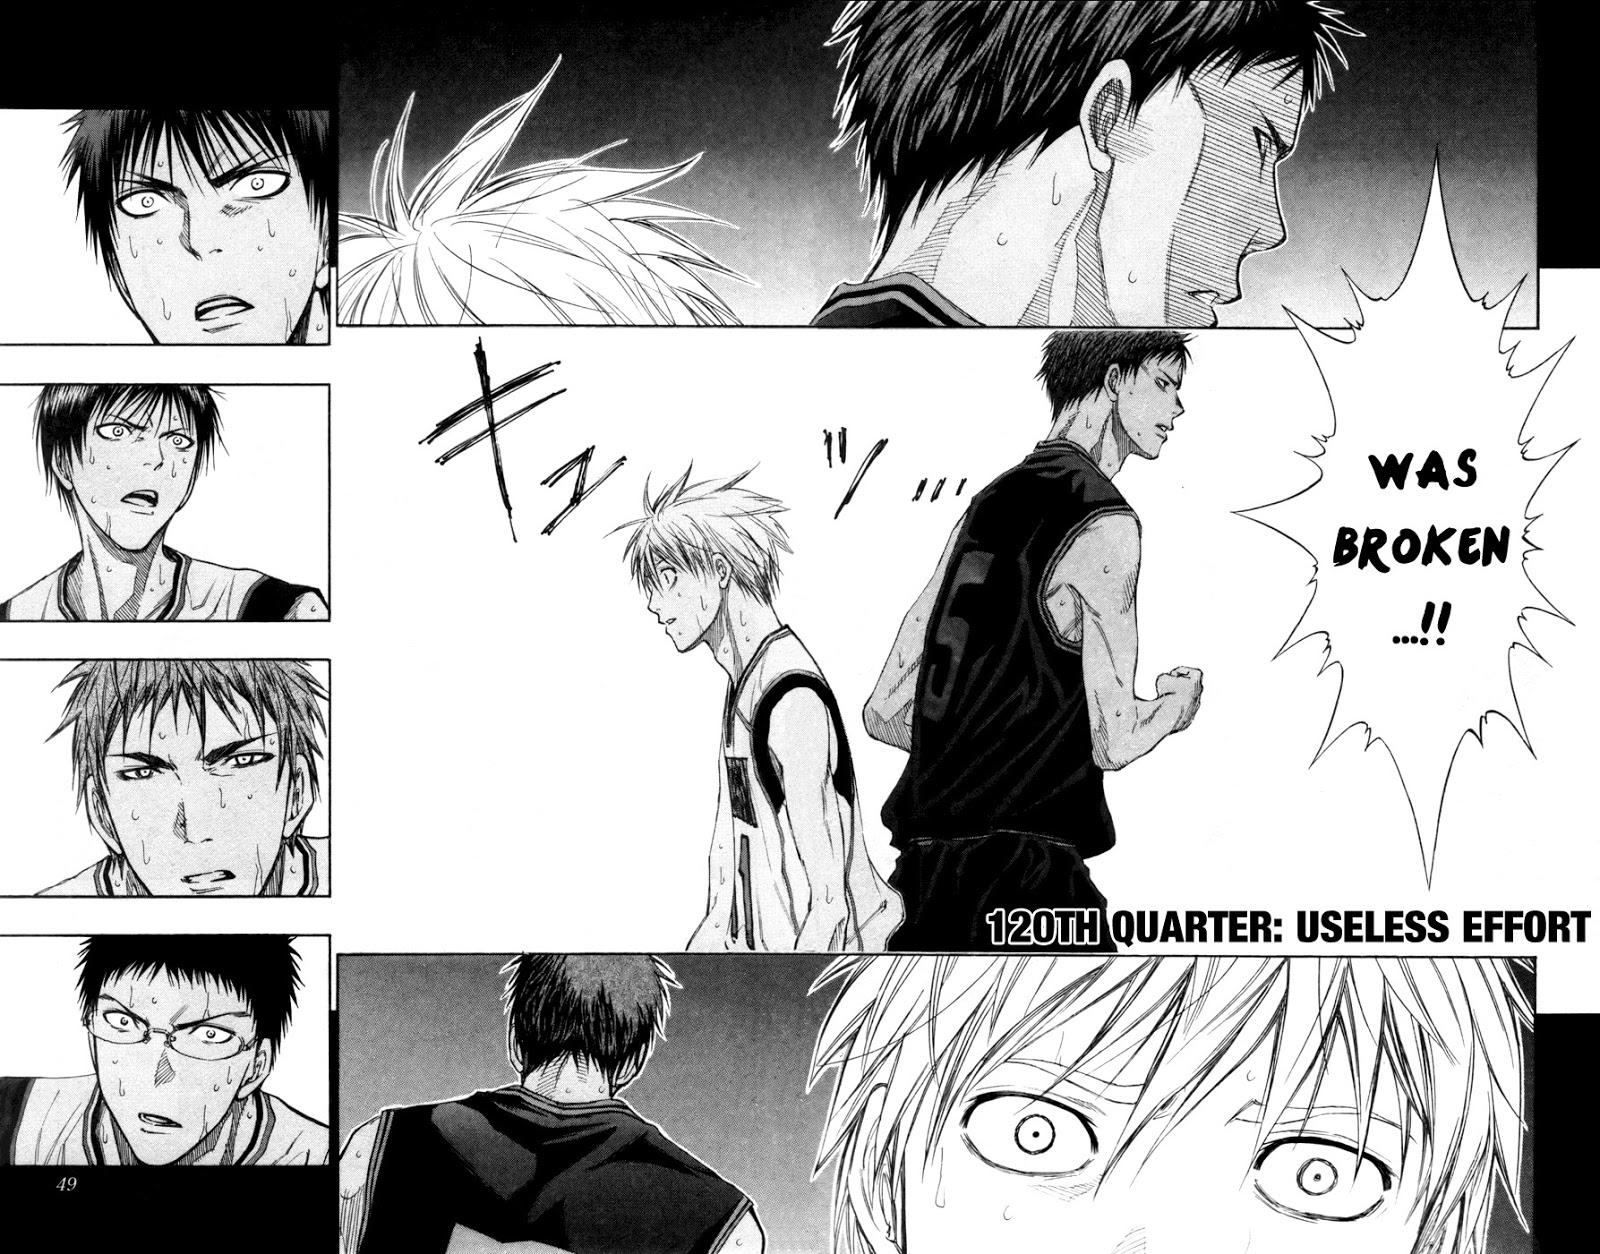 Kuroko no Basket Manga Chapter 120 - Image 002-03